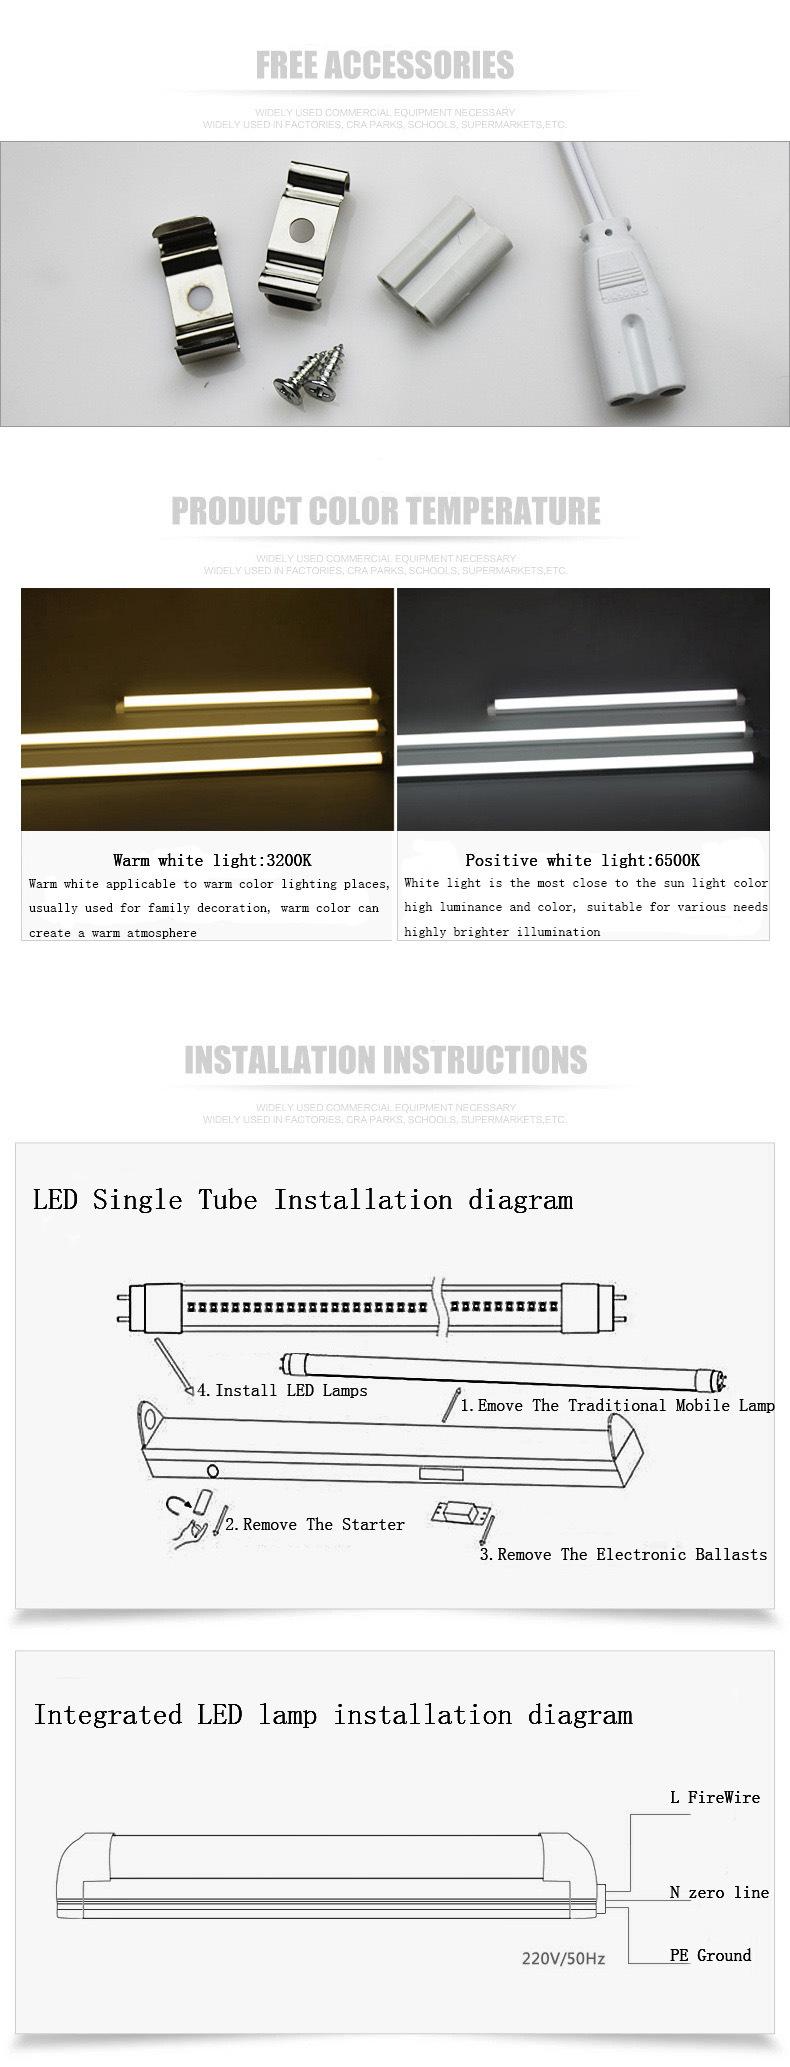 9w 15w 18w 22w 25w 600 900 1200 1500mm T5 T8 Led Tube Light For Circuit Diagram Buy Contact Us